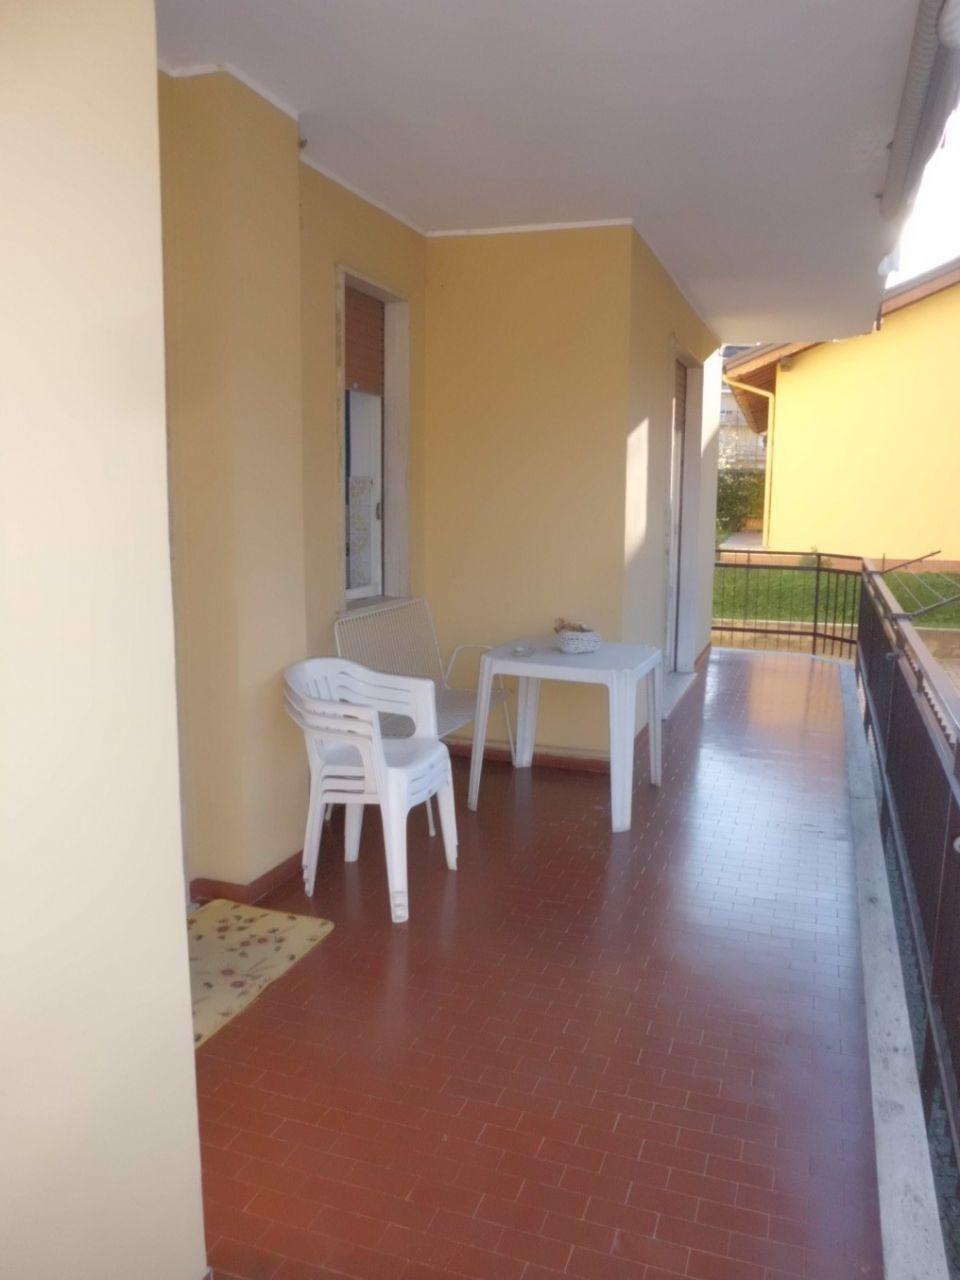 Bilocale Arona Via Piave 38 3